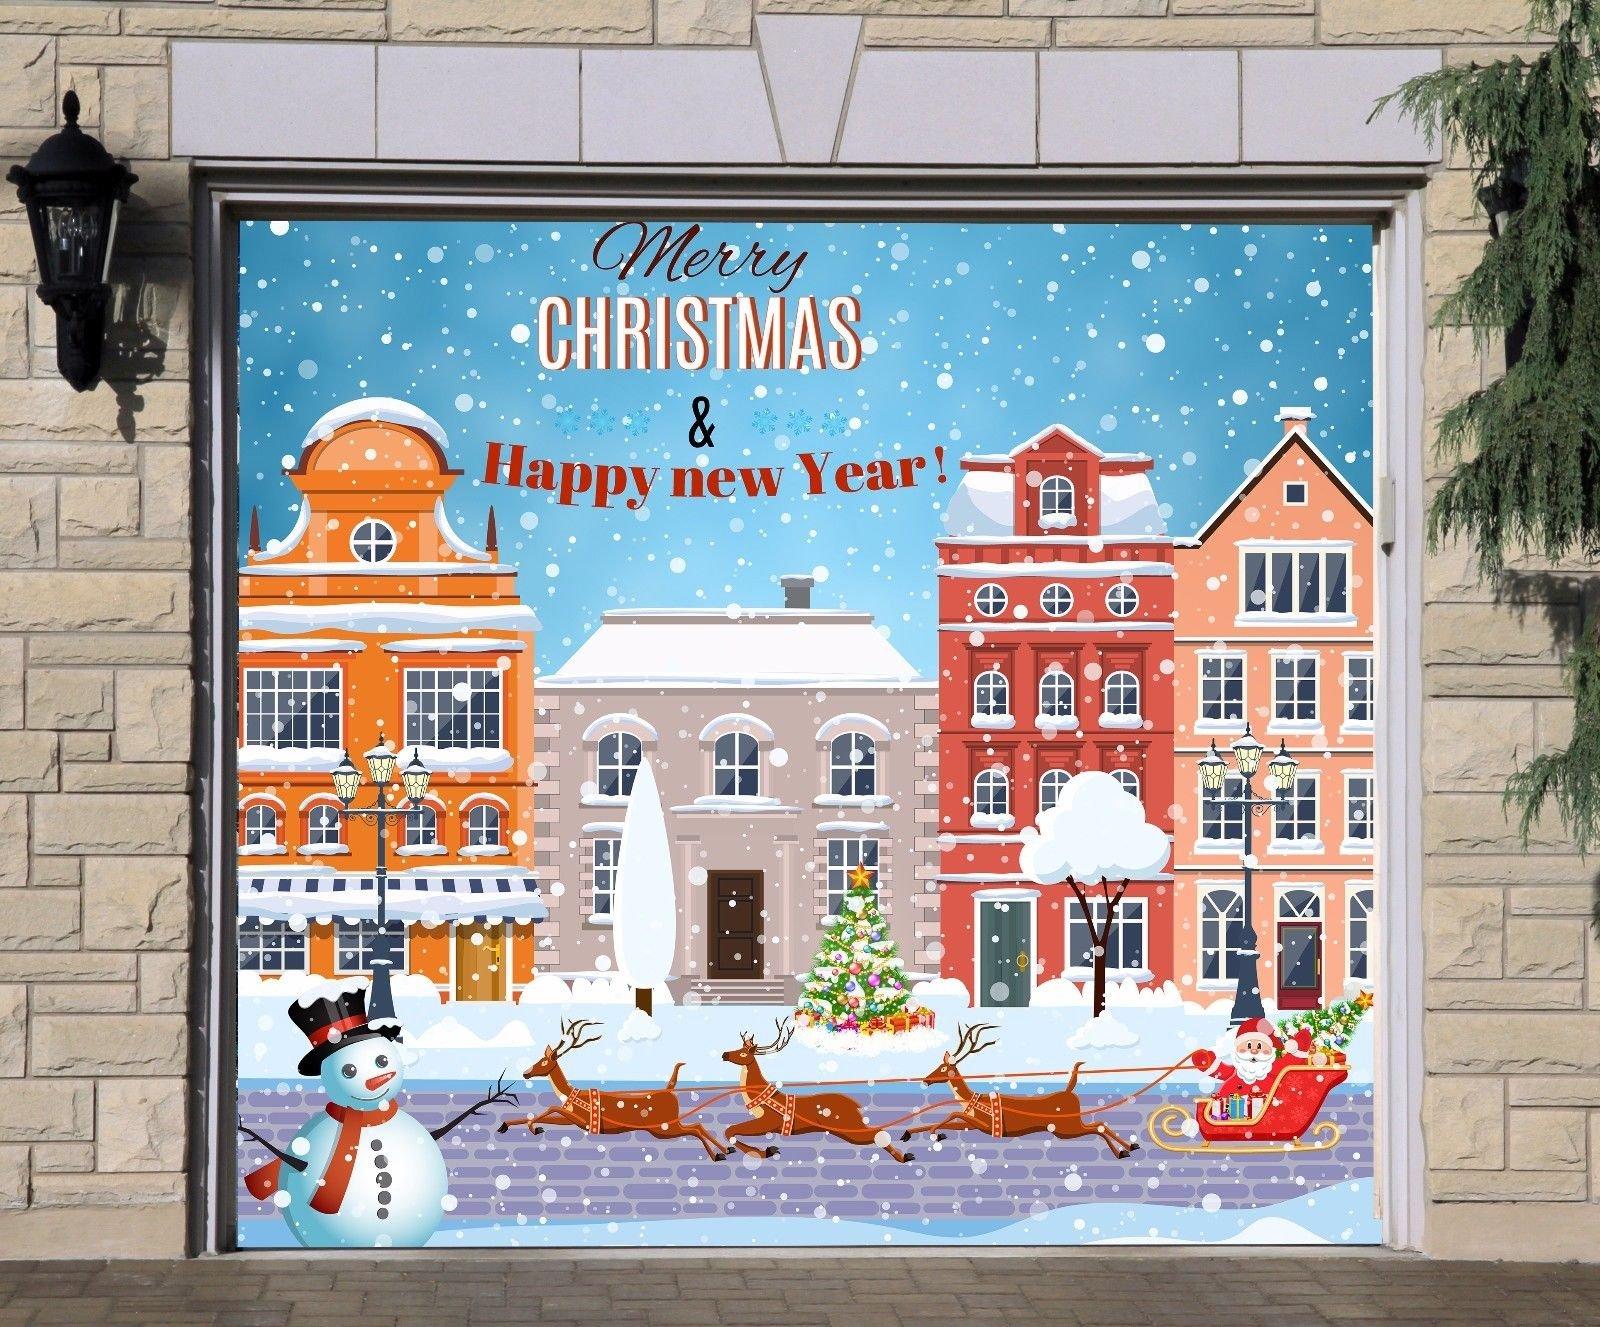 Christmas Сity Single Garage Door Covers Billboard Full Color 3D Effect Print Door Decor Decorations of House Garage Holiday Mural Banner Garage Door Banner Size 83 x 96 inches DAV209 by WallTattooHome